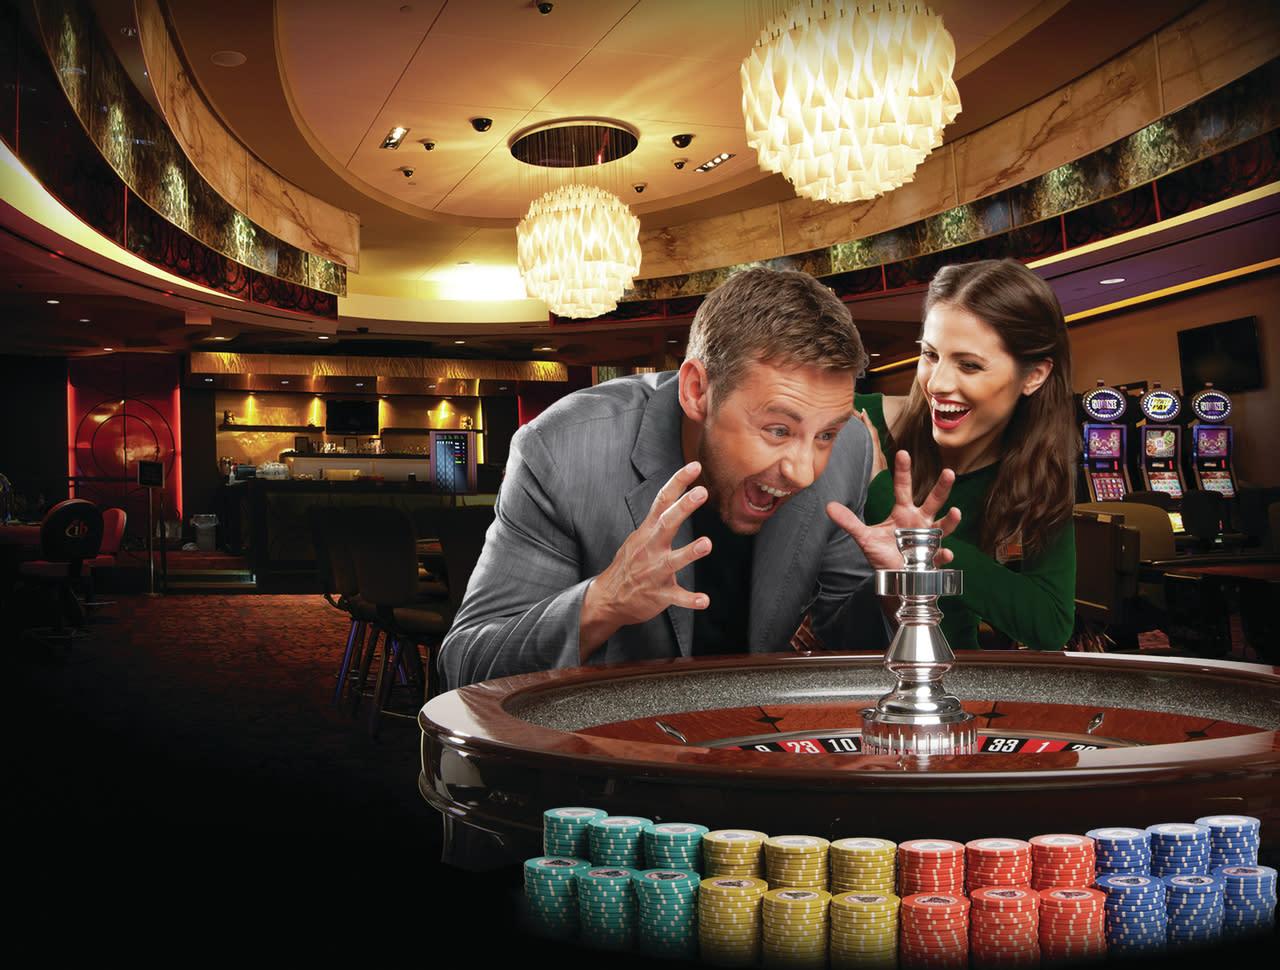 Abba mania casino gambling and betting adsense